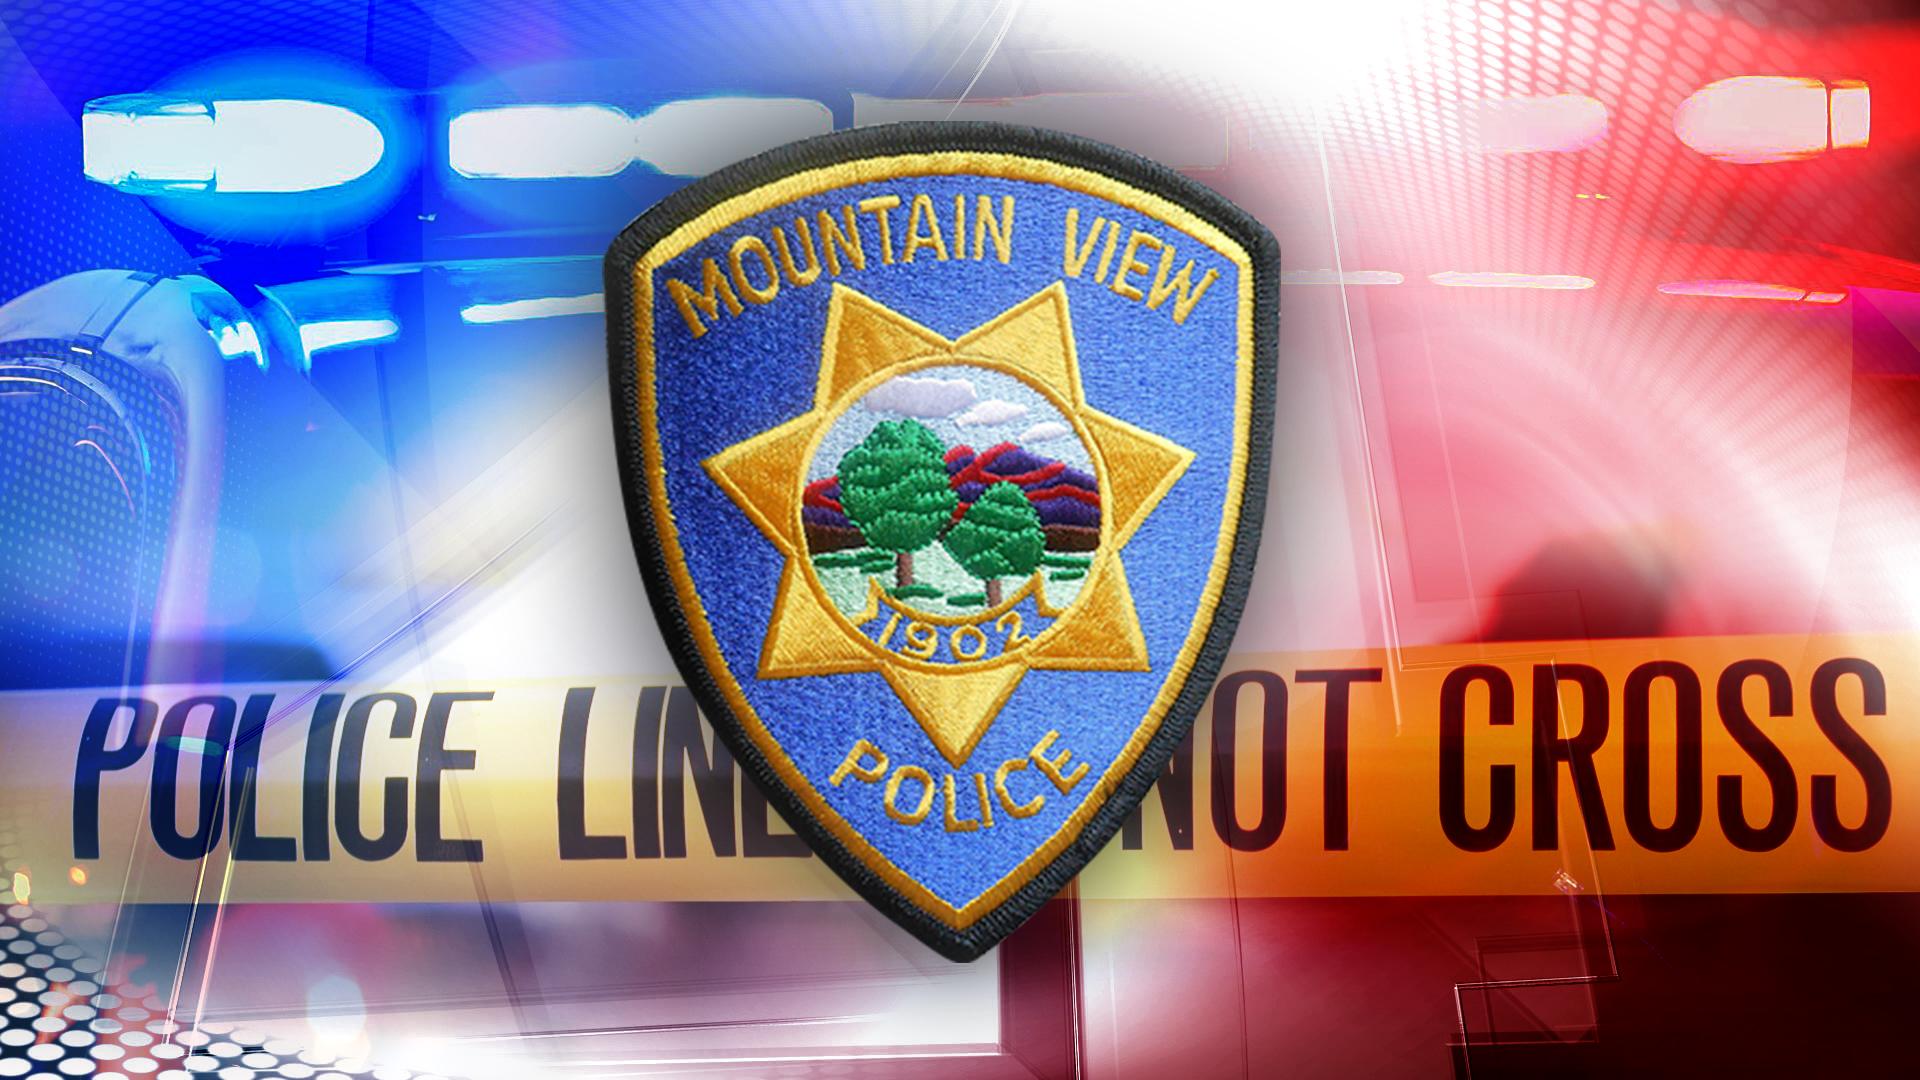 FS Police Mountain View_1559169410411.jpg.jpg